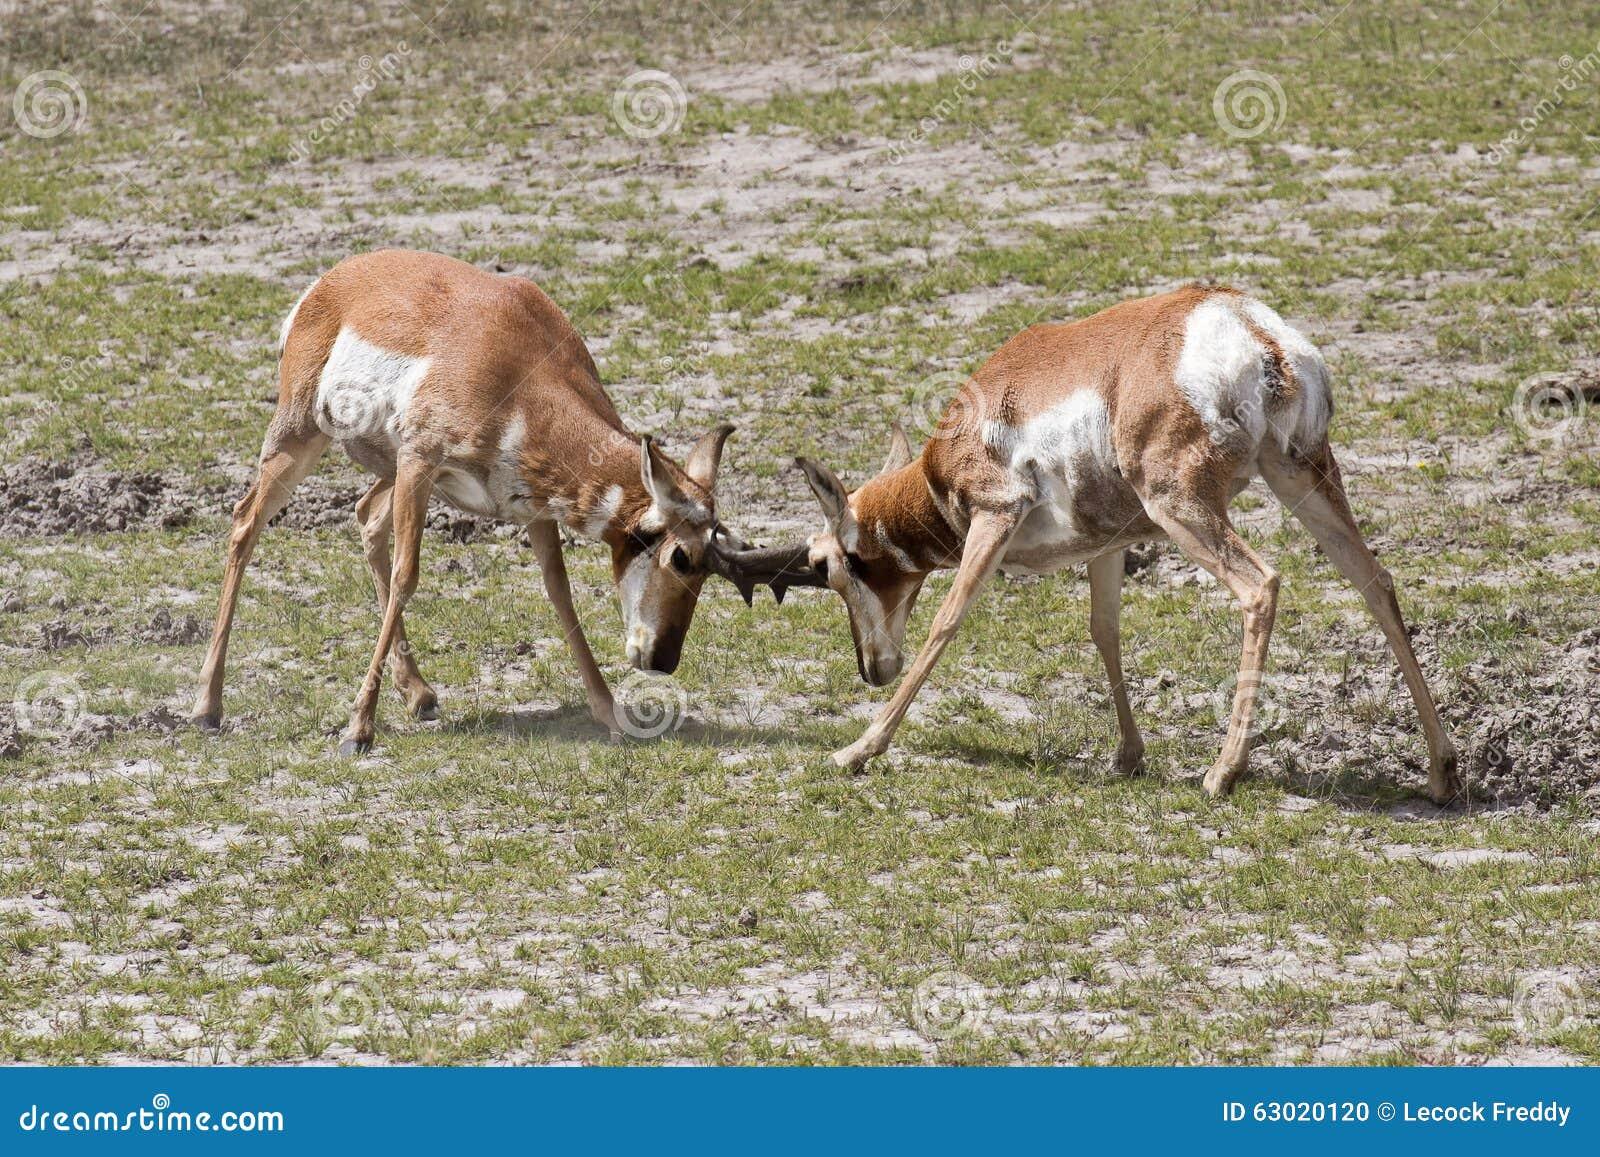 Pronghorn antelopes